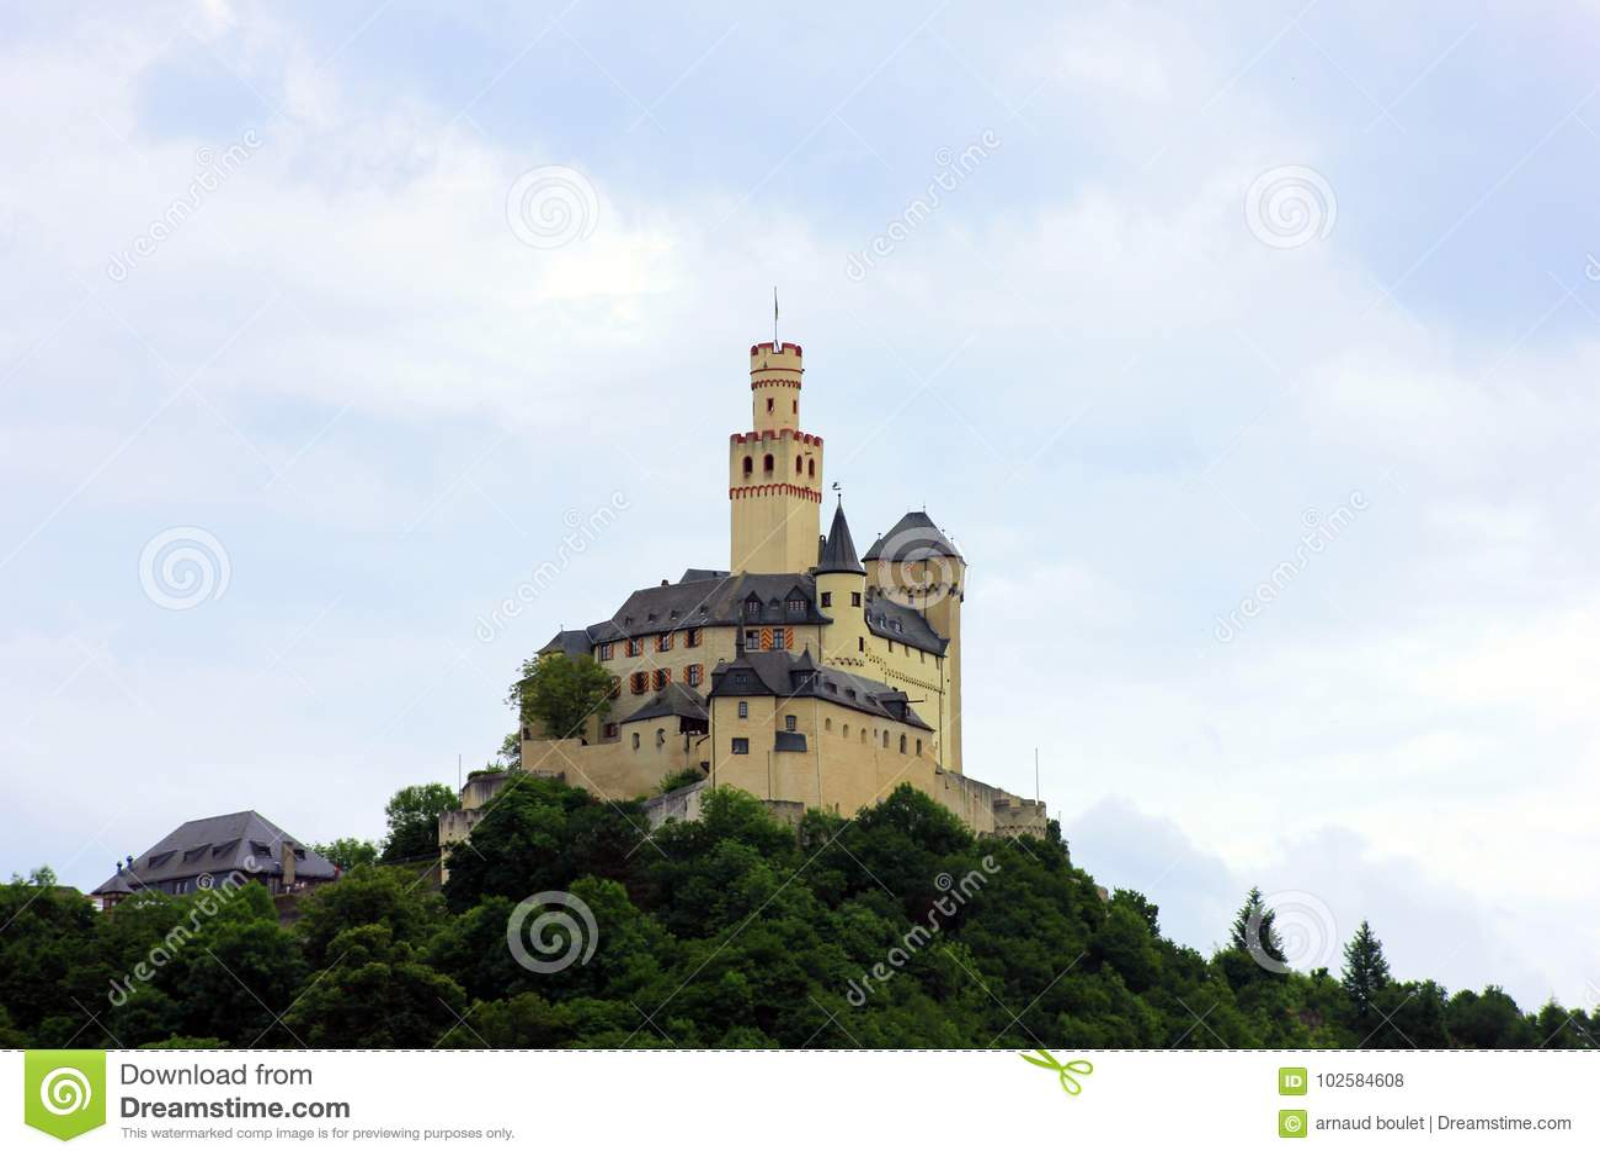 Château à bord du Rhin